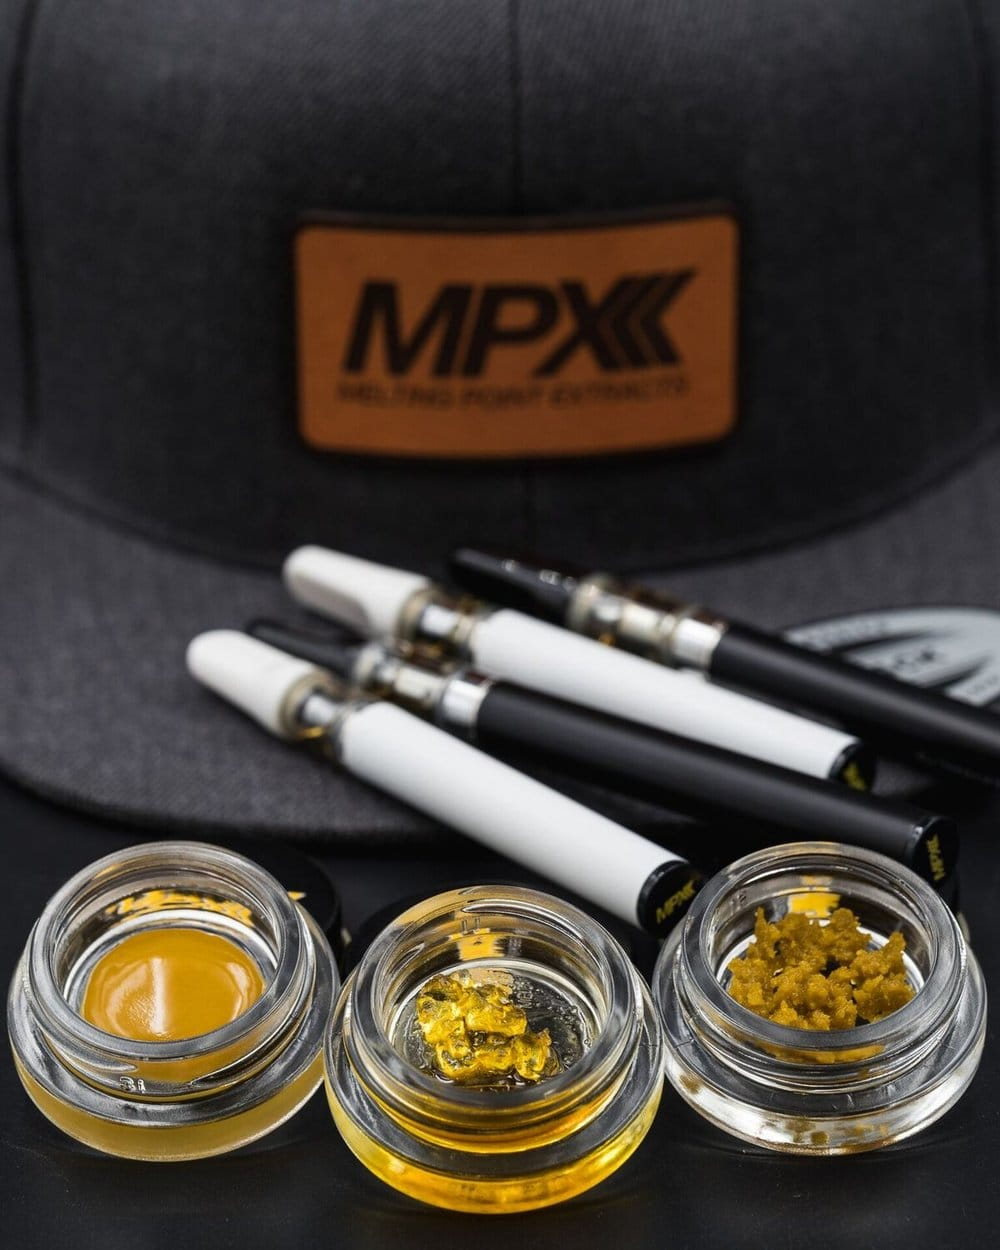 mpx 4 image